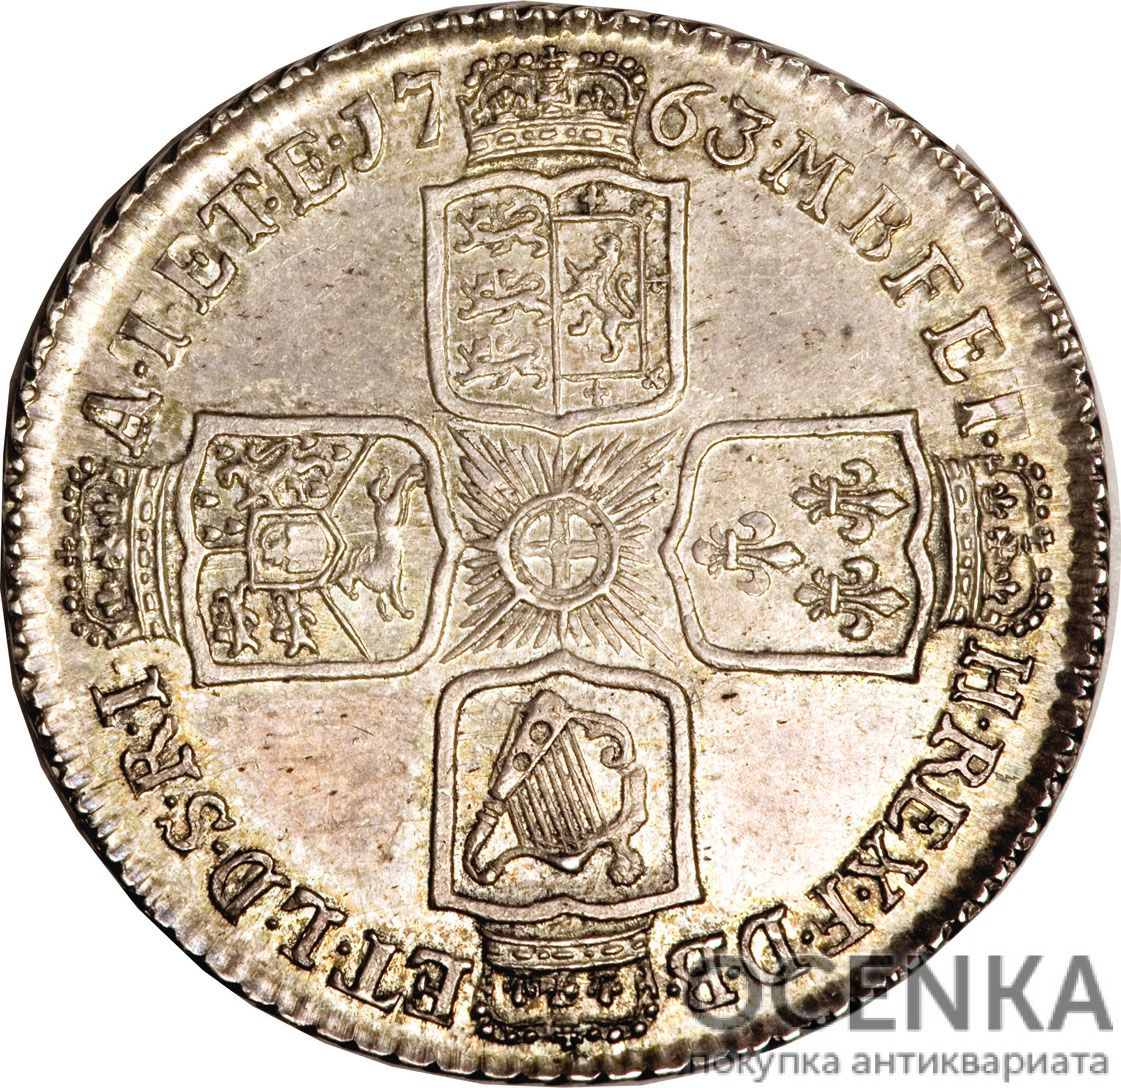 Серебряная монета 1 Шиллинг (1 Shilling) Великобритания - 2